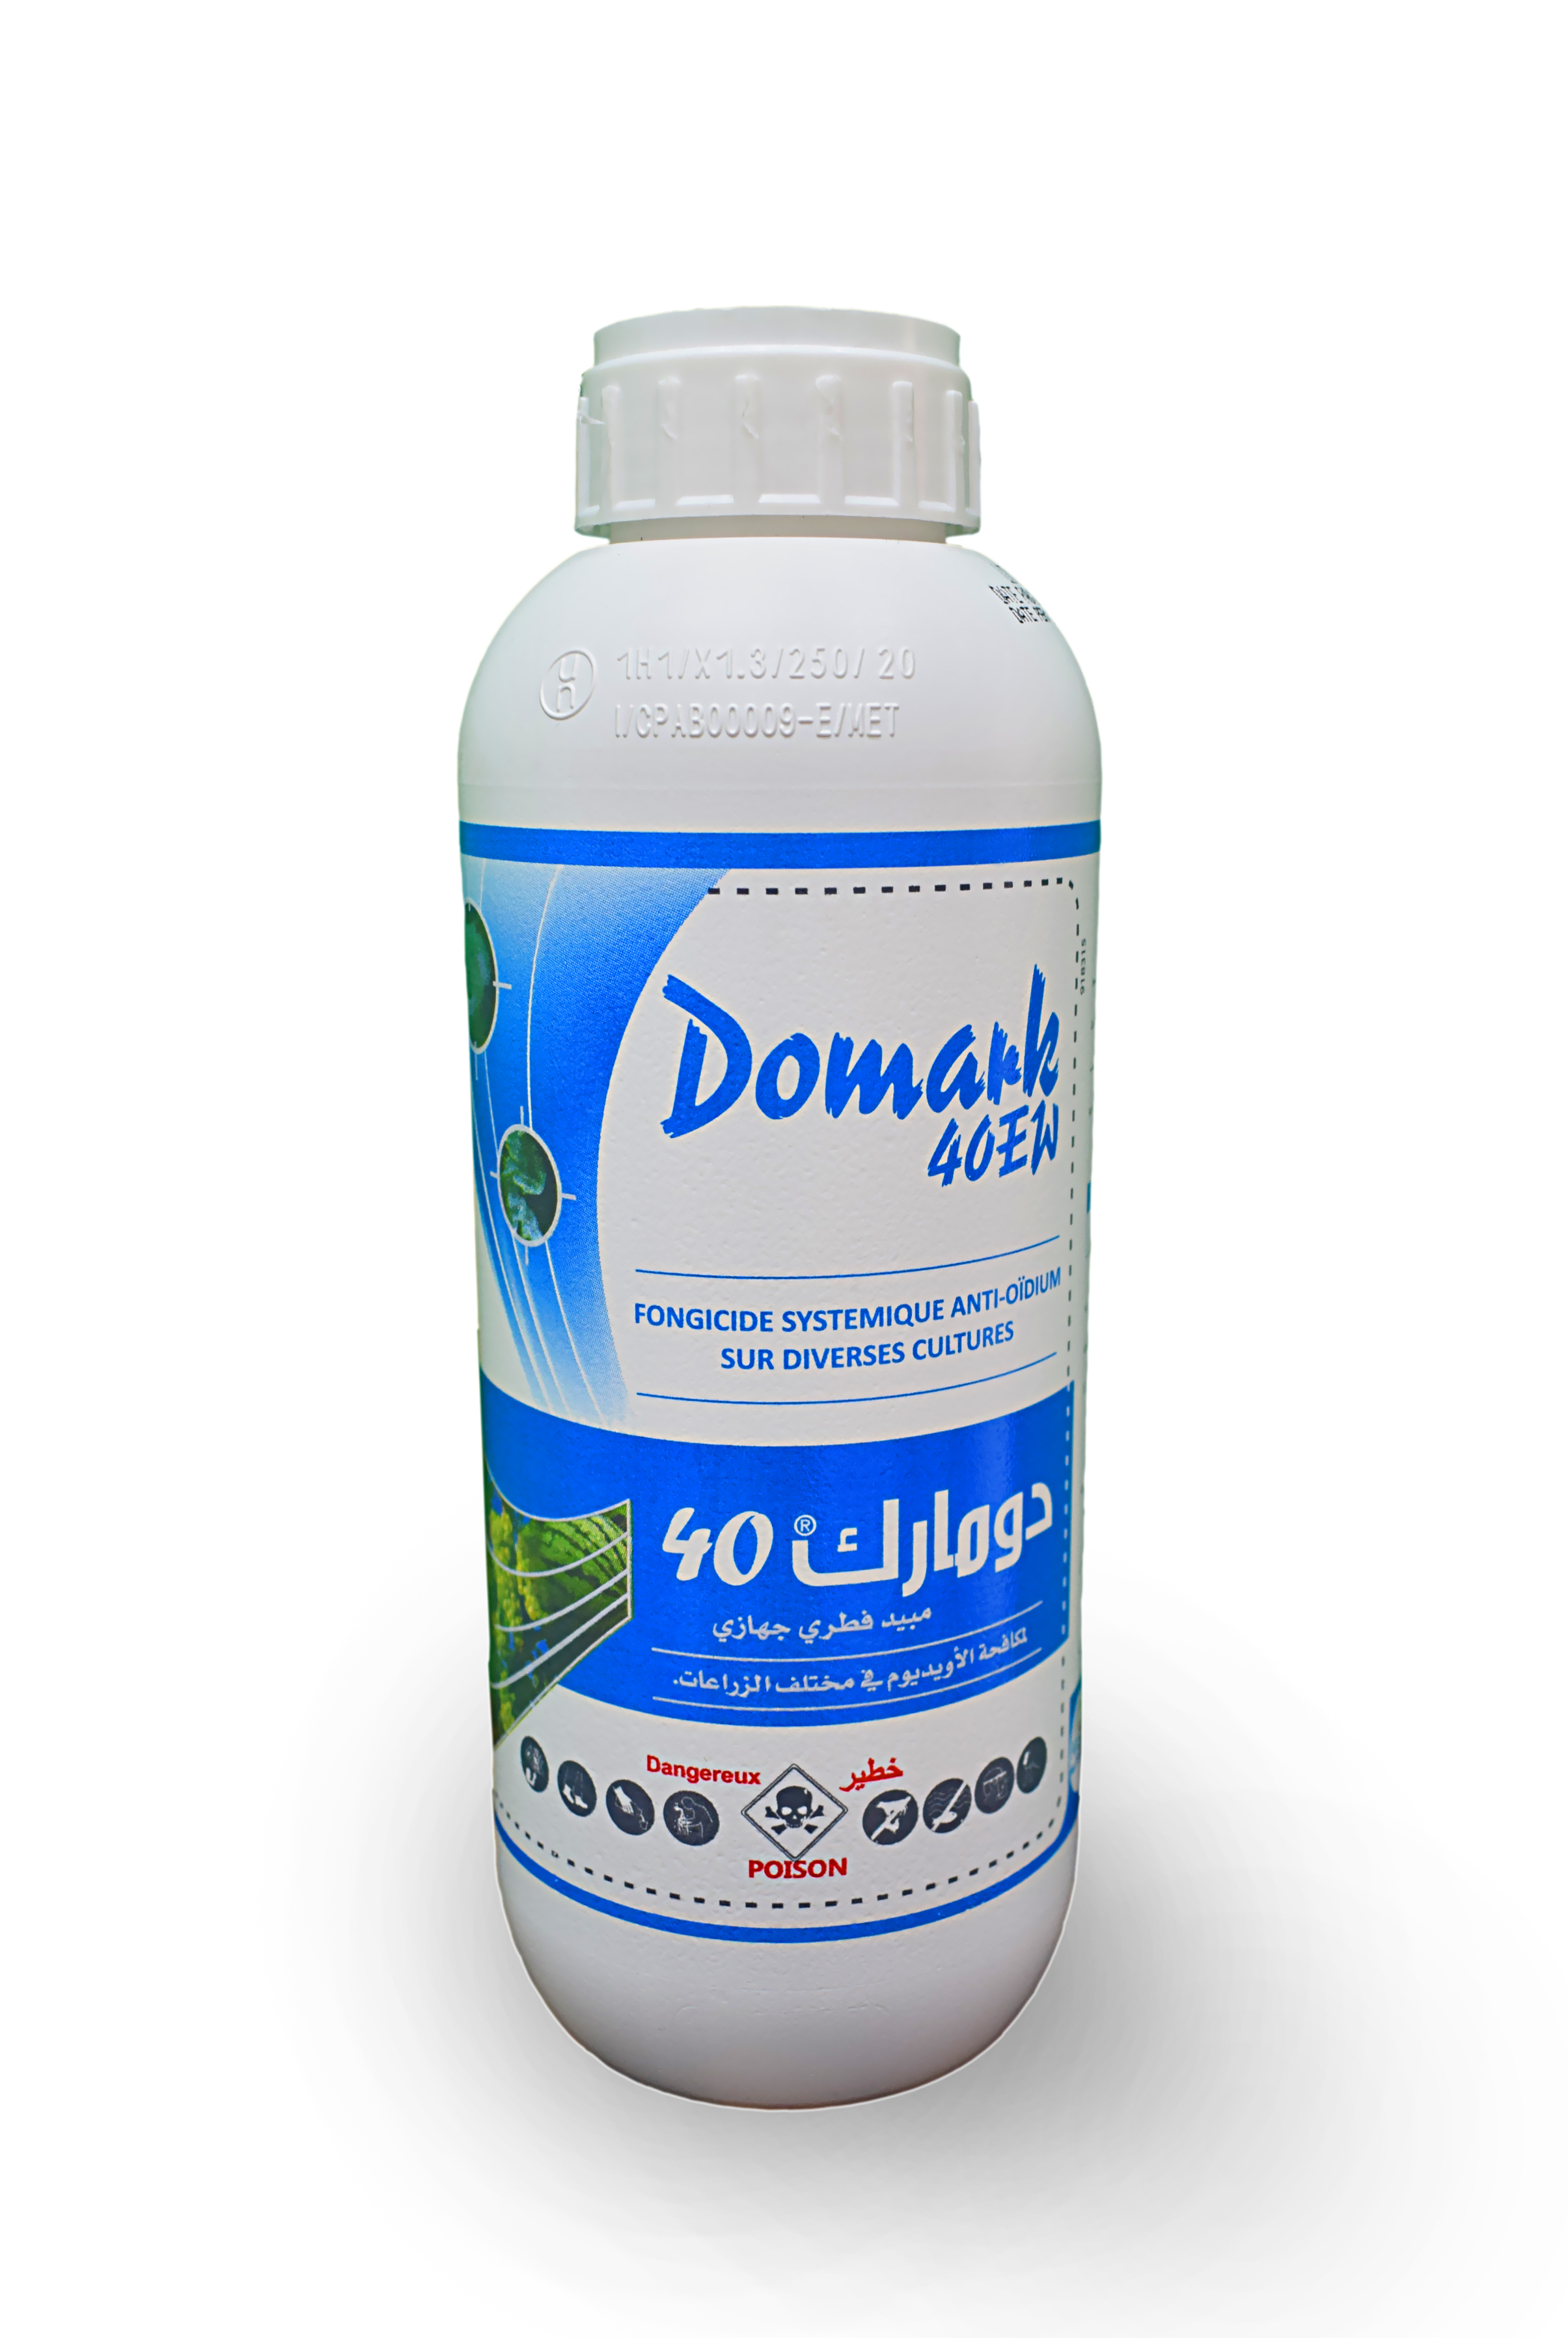 Domark 40